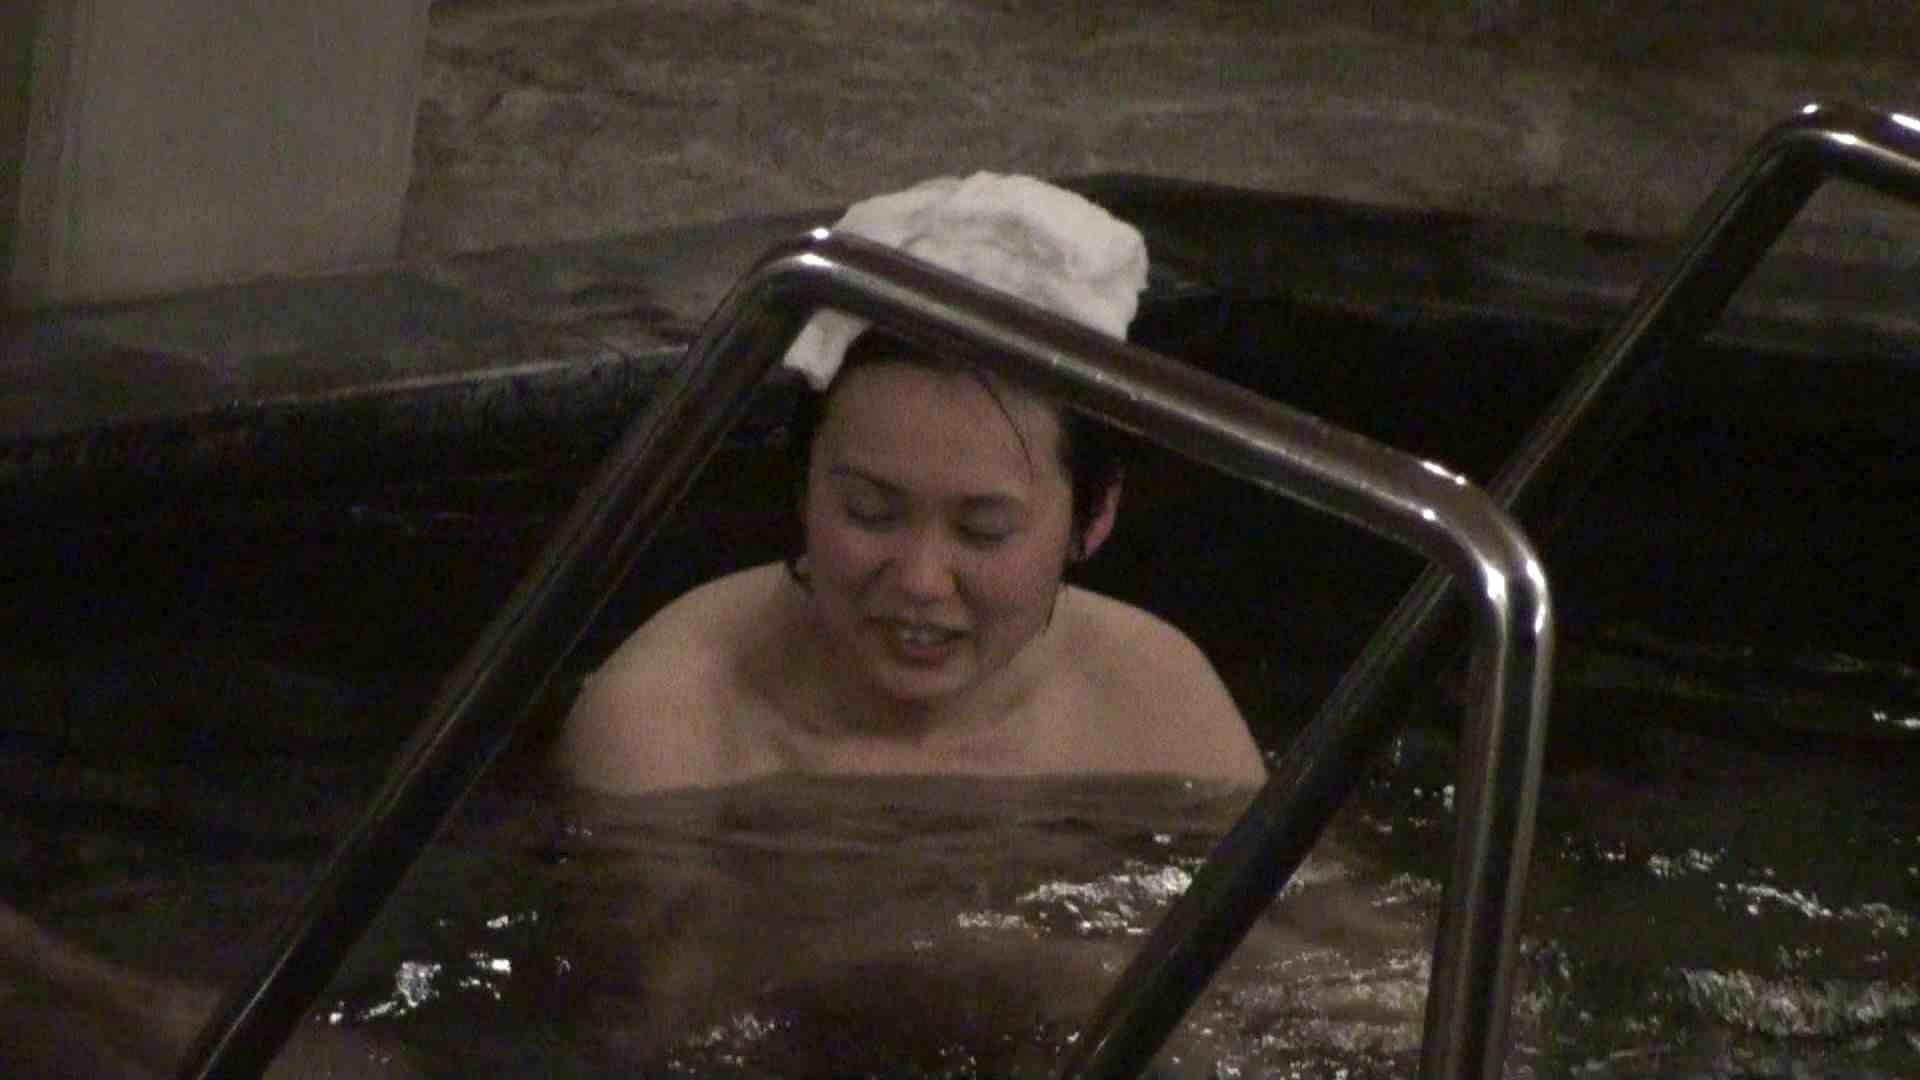 Aquaな露天風呂Vol.333 0   0  106連発 39